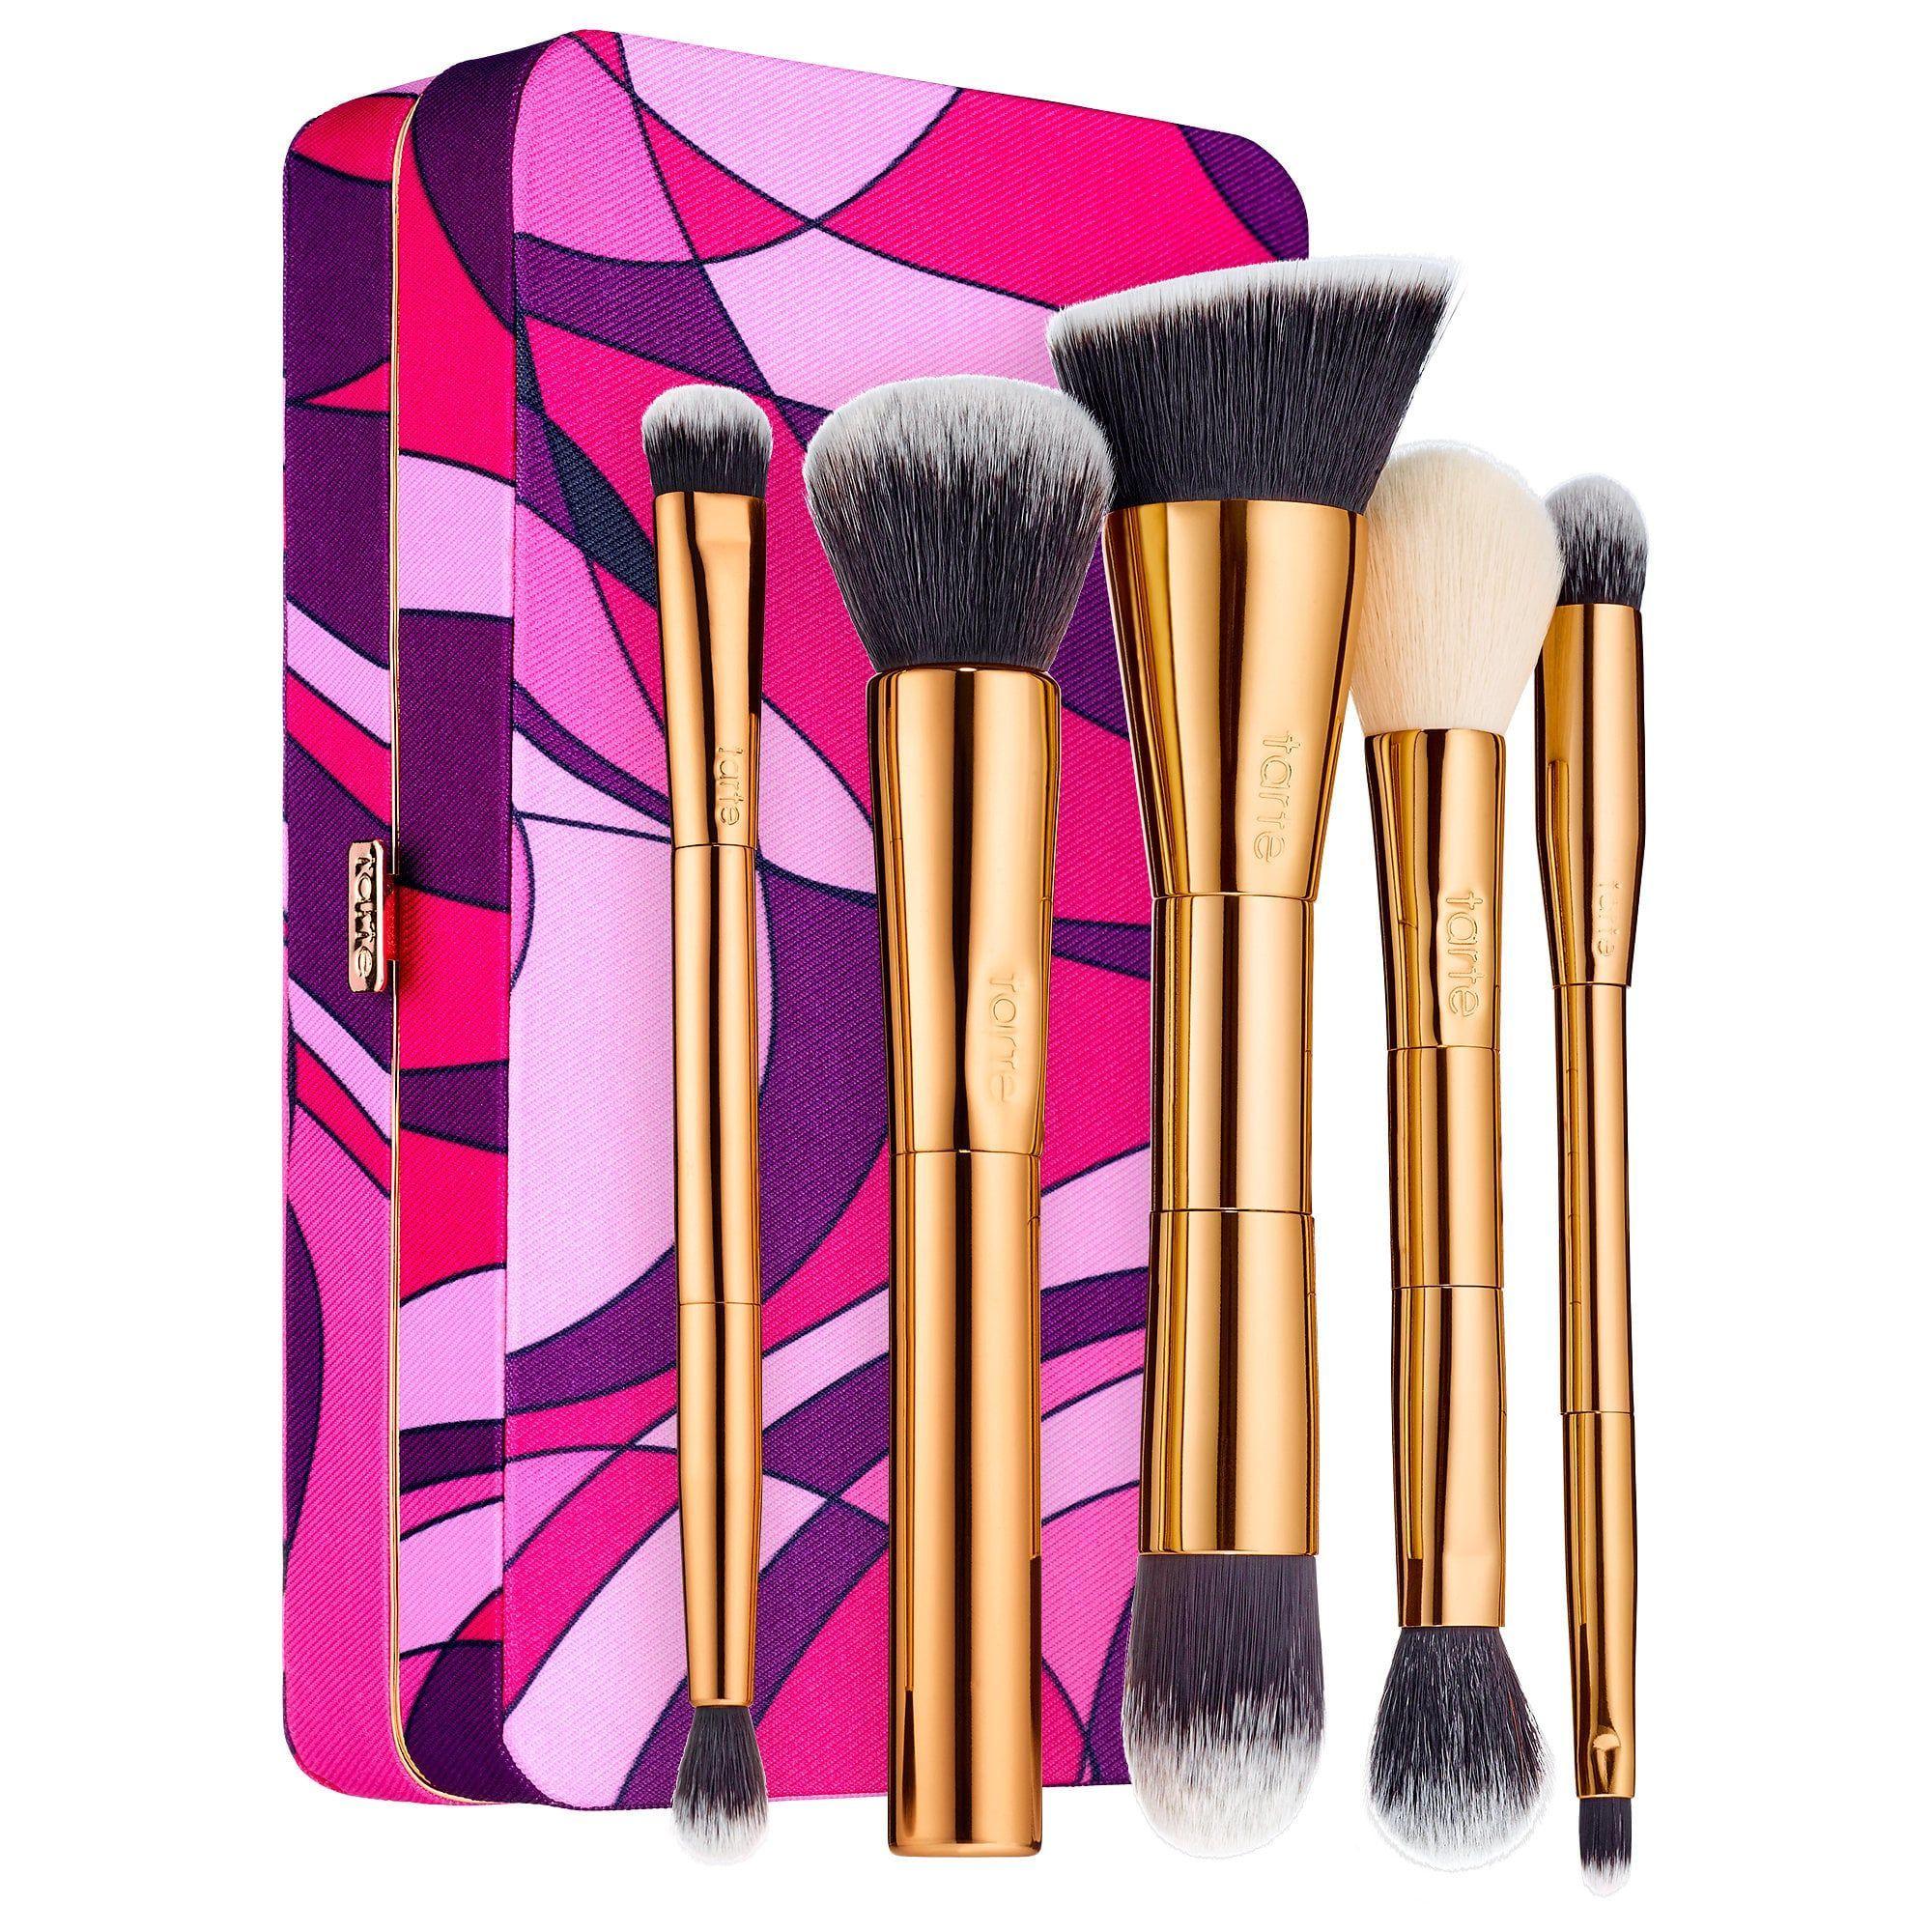 Sephora tarte Tarteist? Toolbox Brush Set &